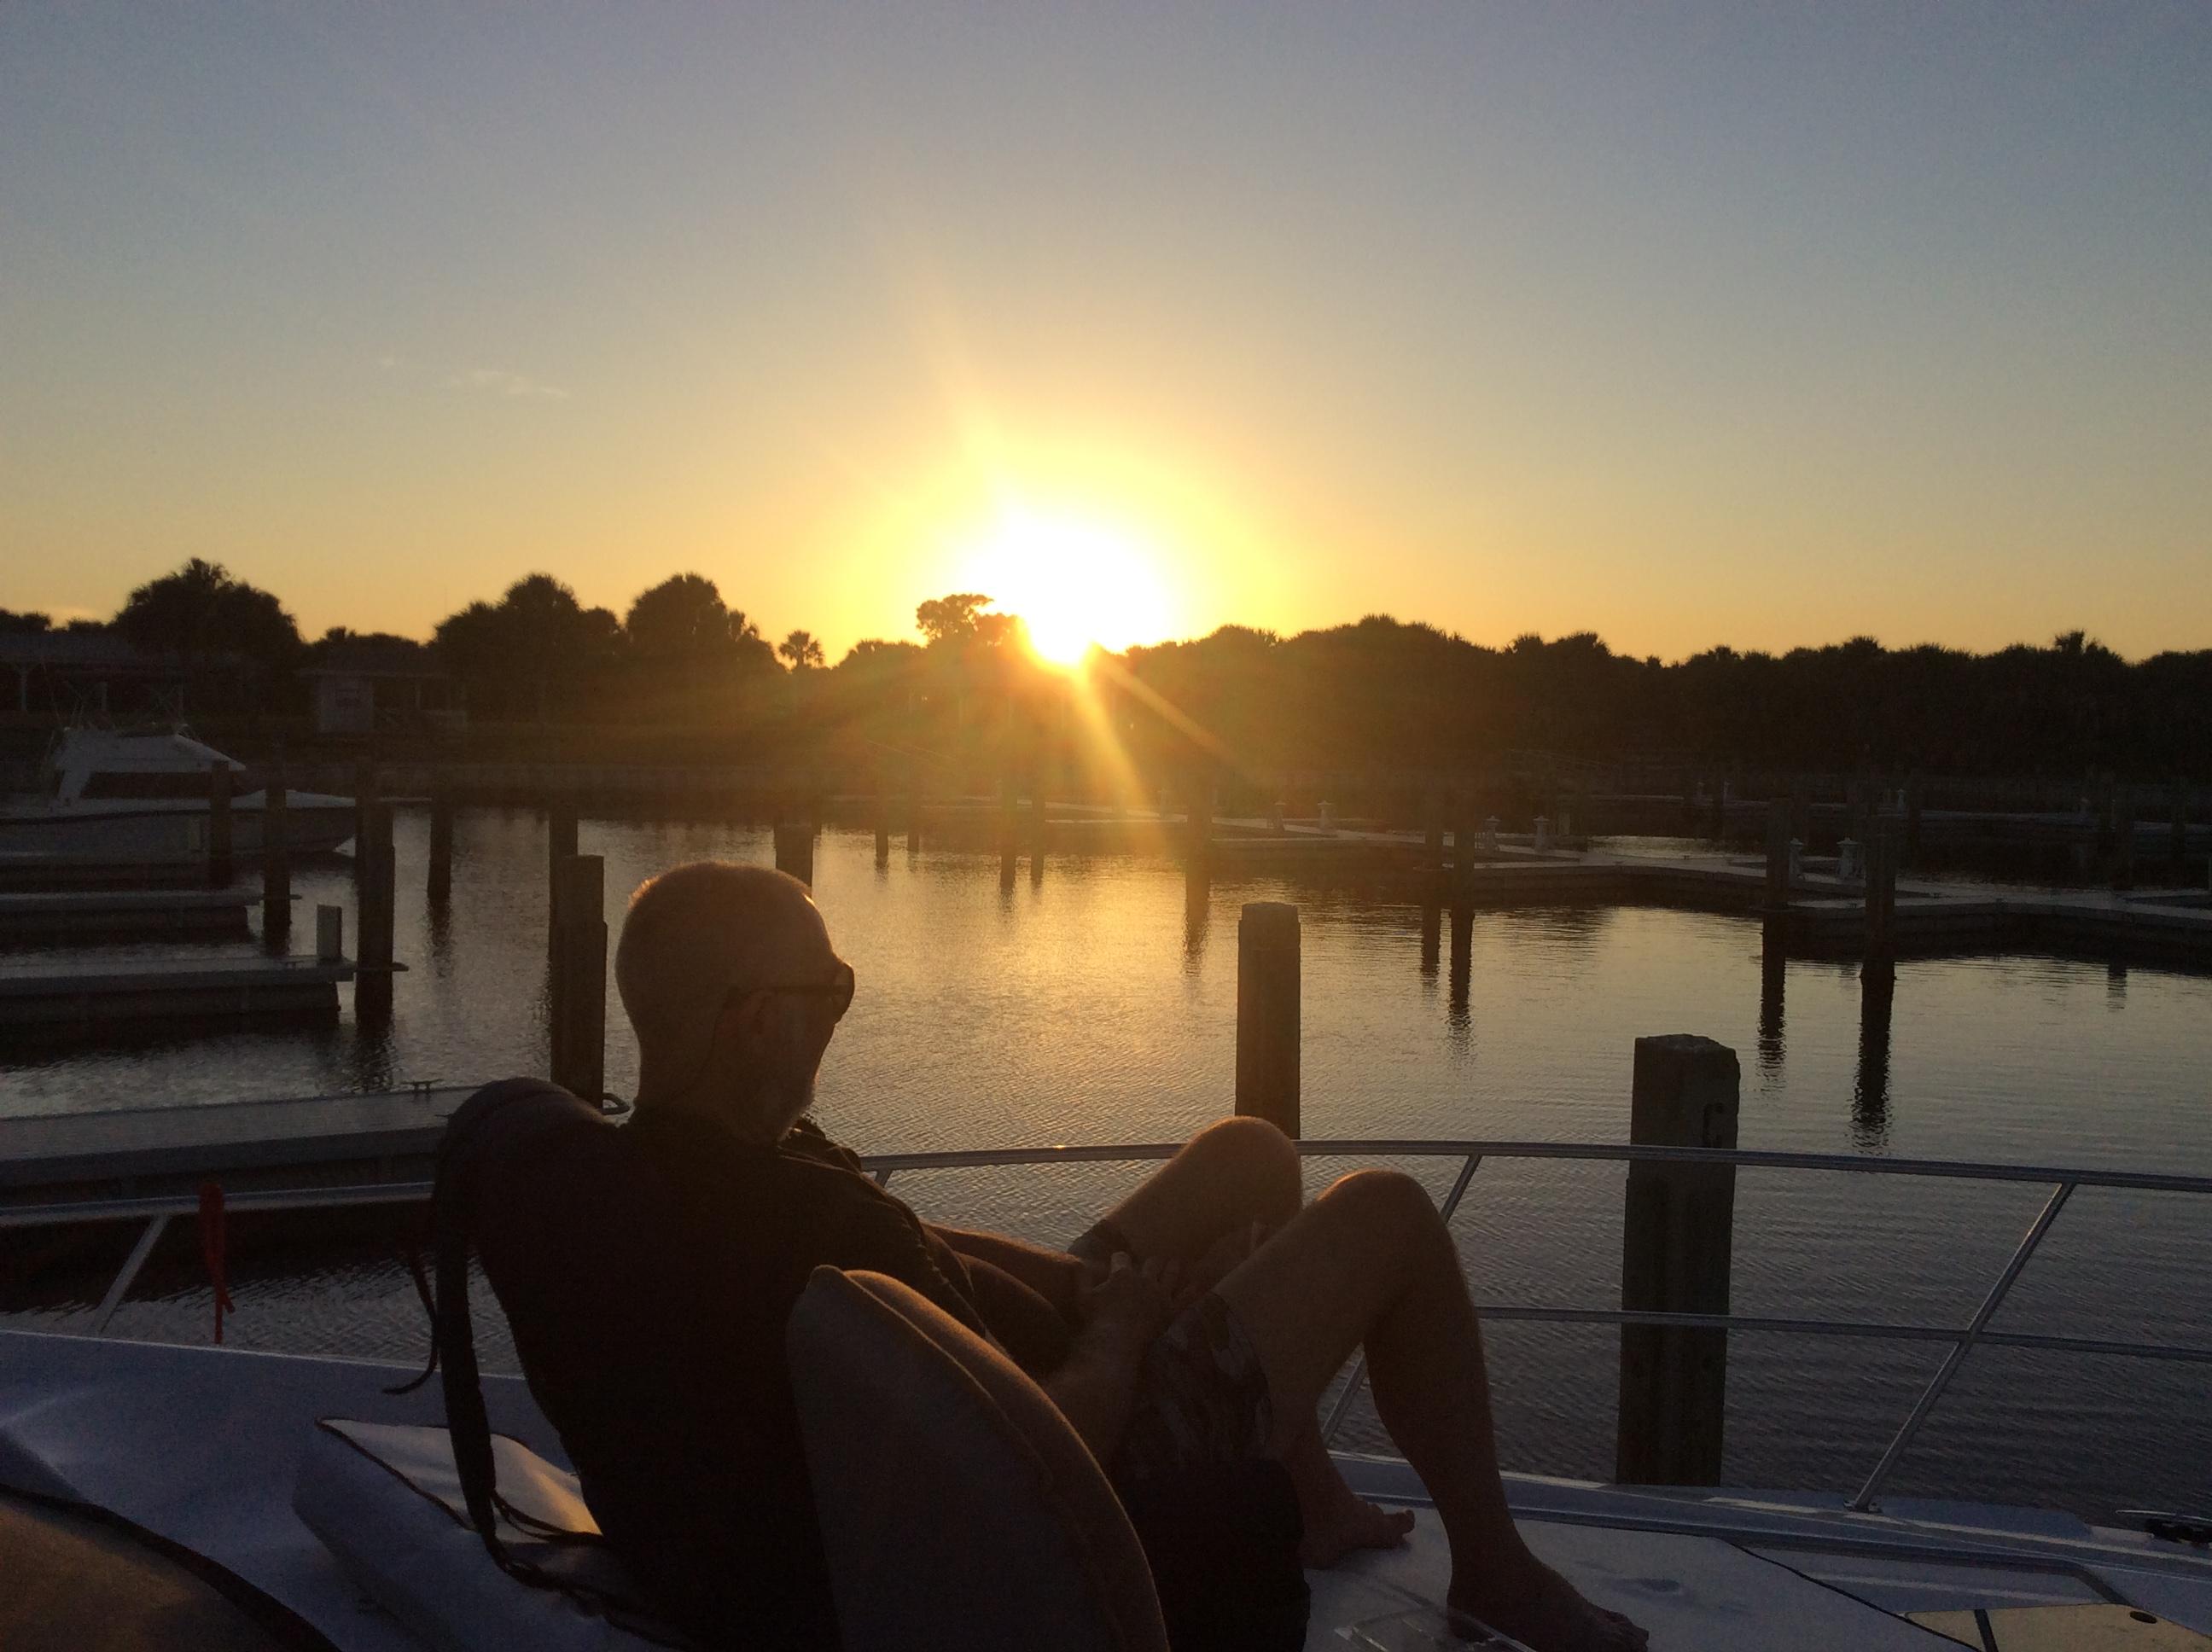 Randy on the bow, Caladesi Island, FL (Oct. 2019)